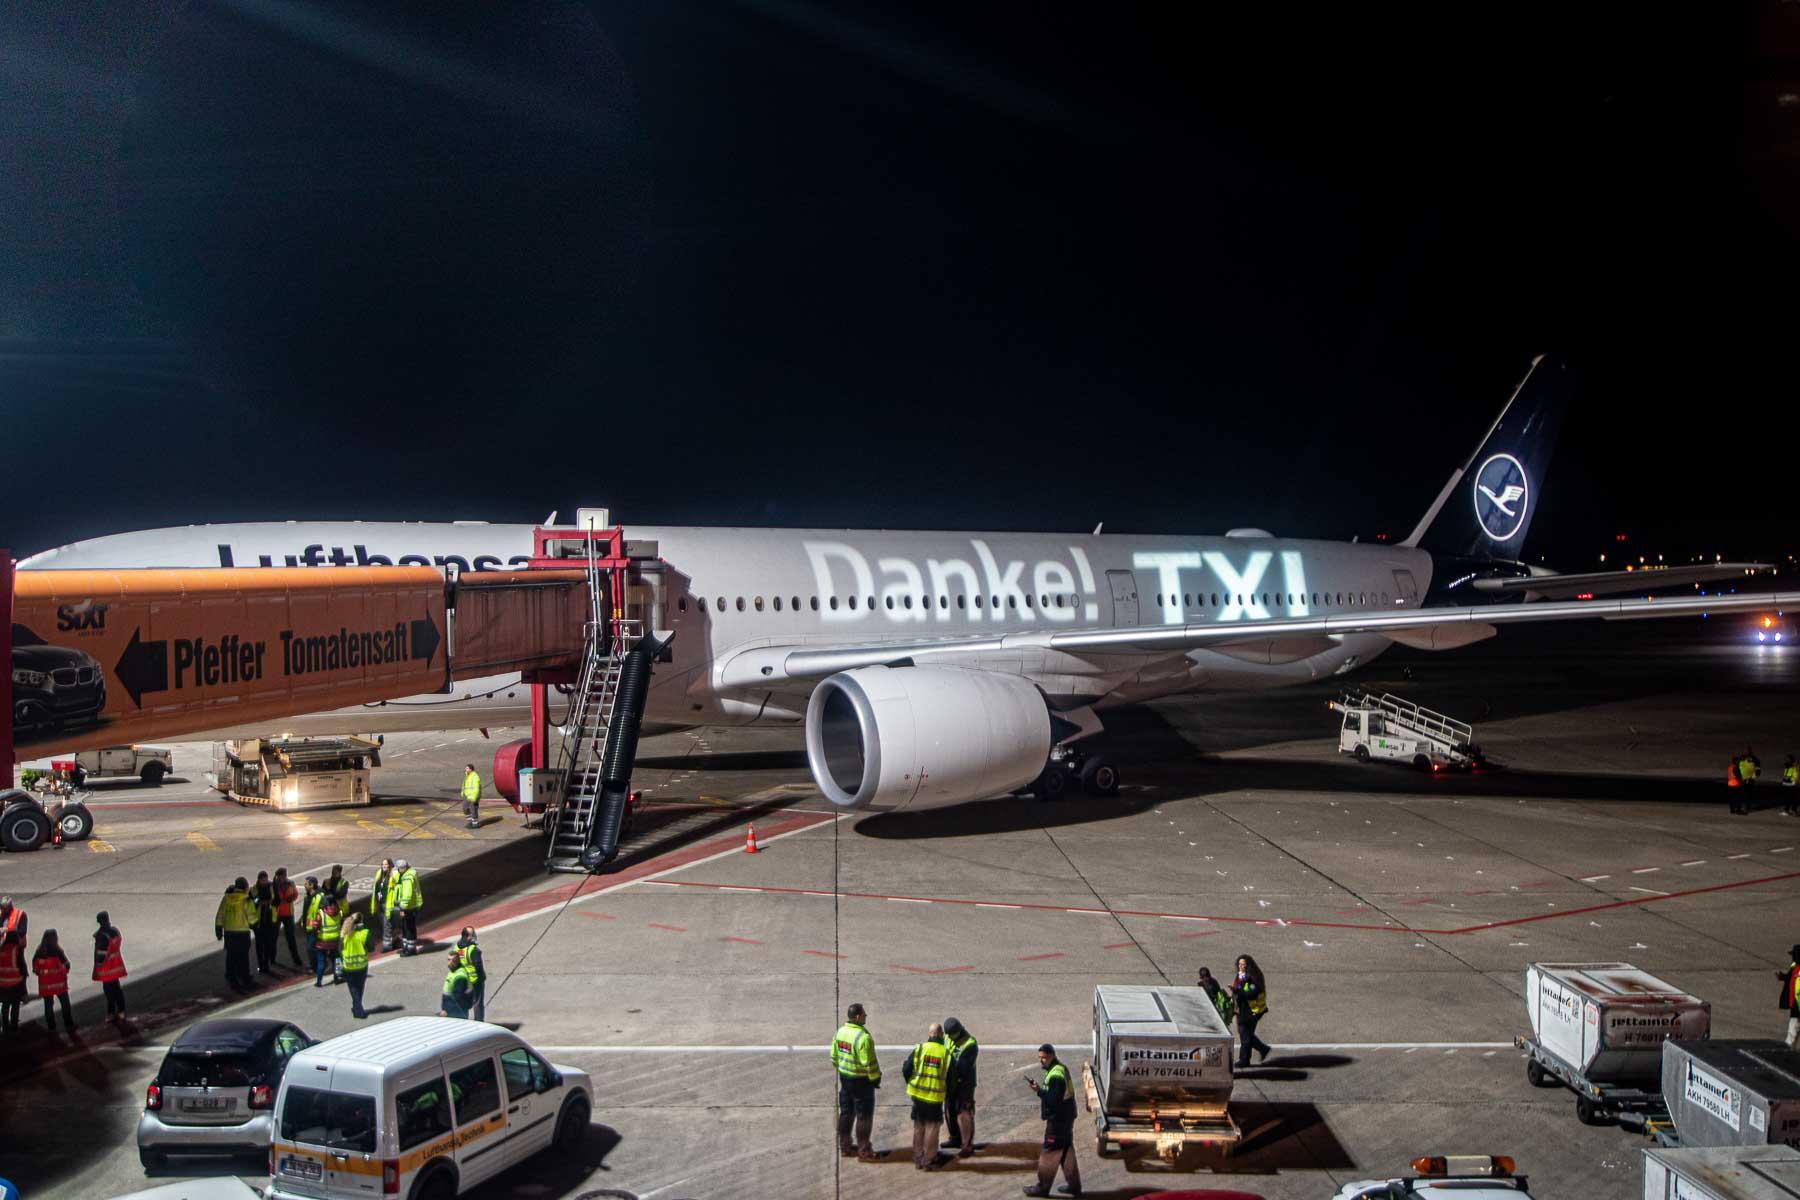 Letzter Lufthansa Flug Berlin Tegel Airbus A350 D-AIXI TXL The Travel Happiness